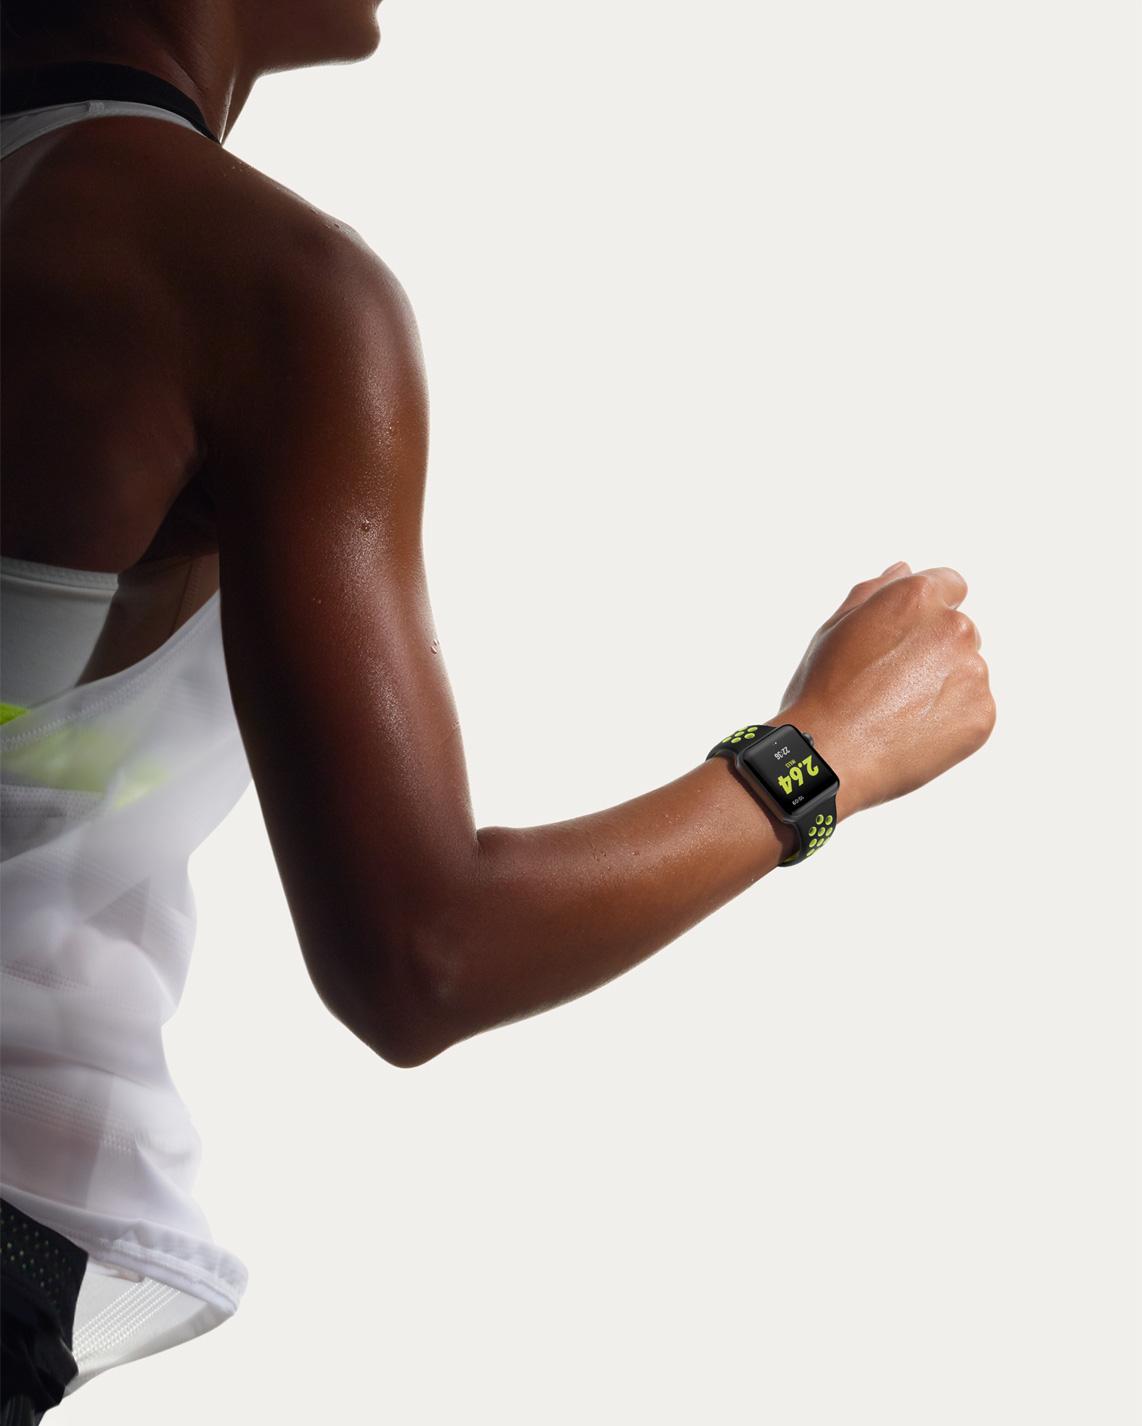 apple-watch-2-nike-runner.jpg